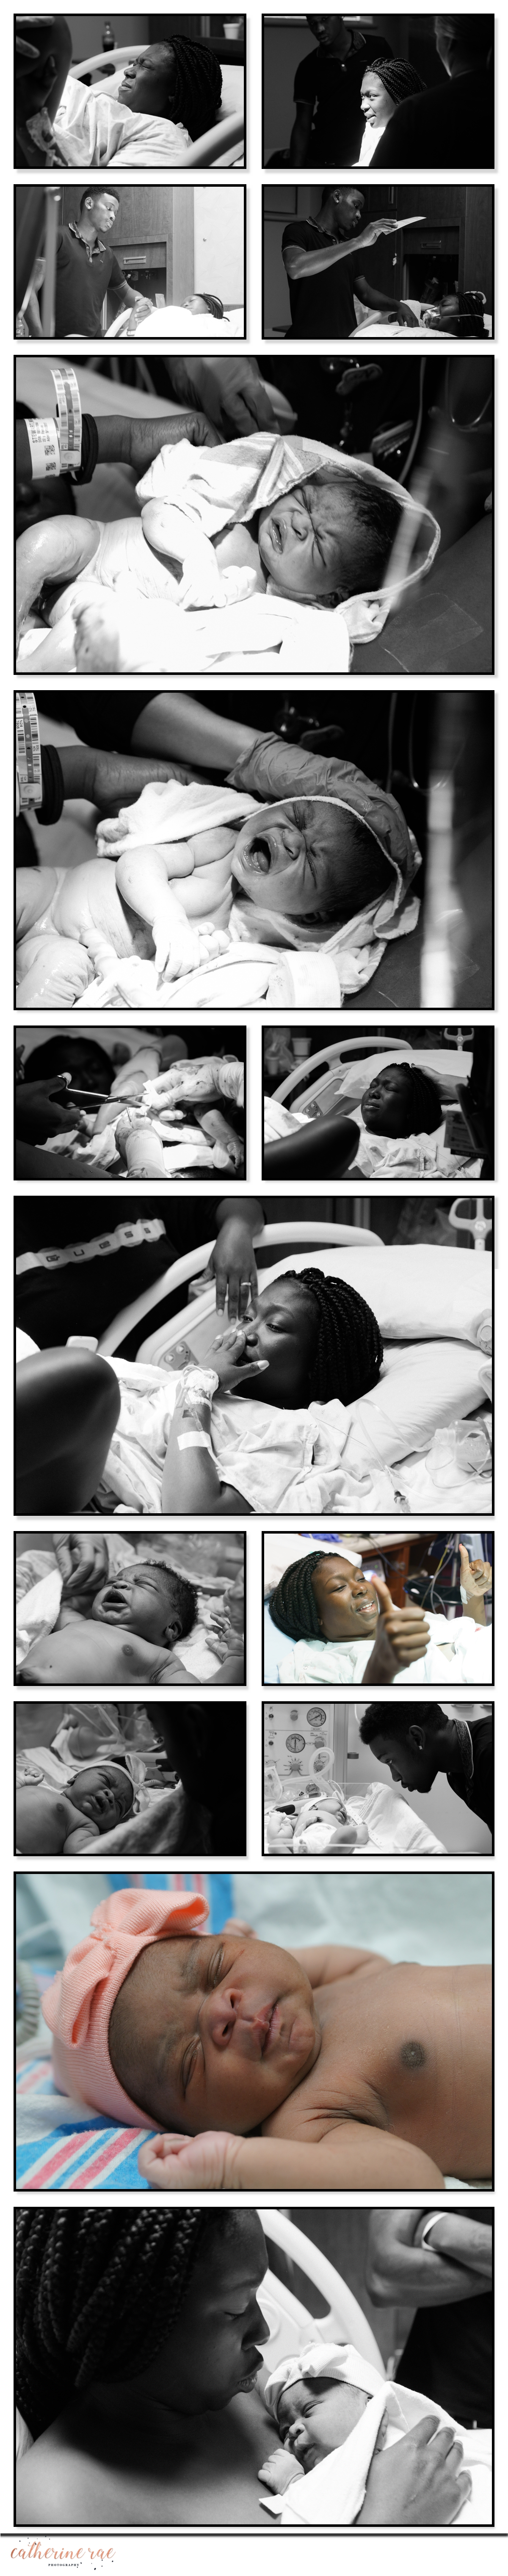 mikaya_birthphotography_CRP 1.jpg